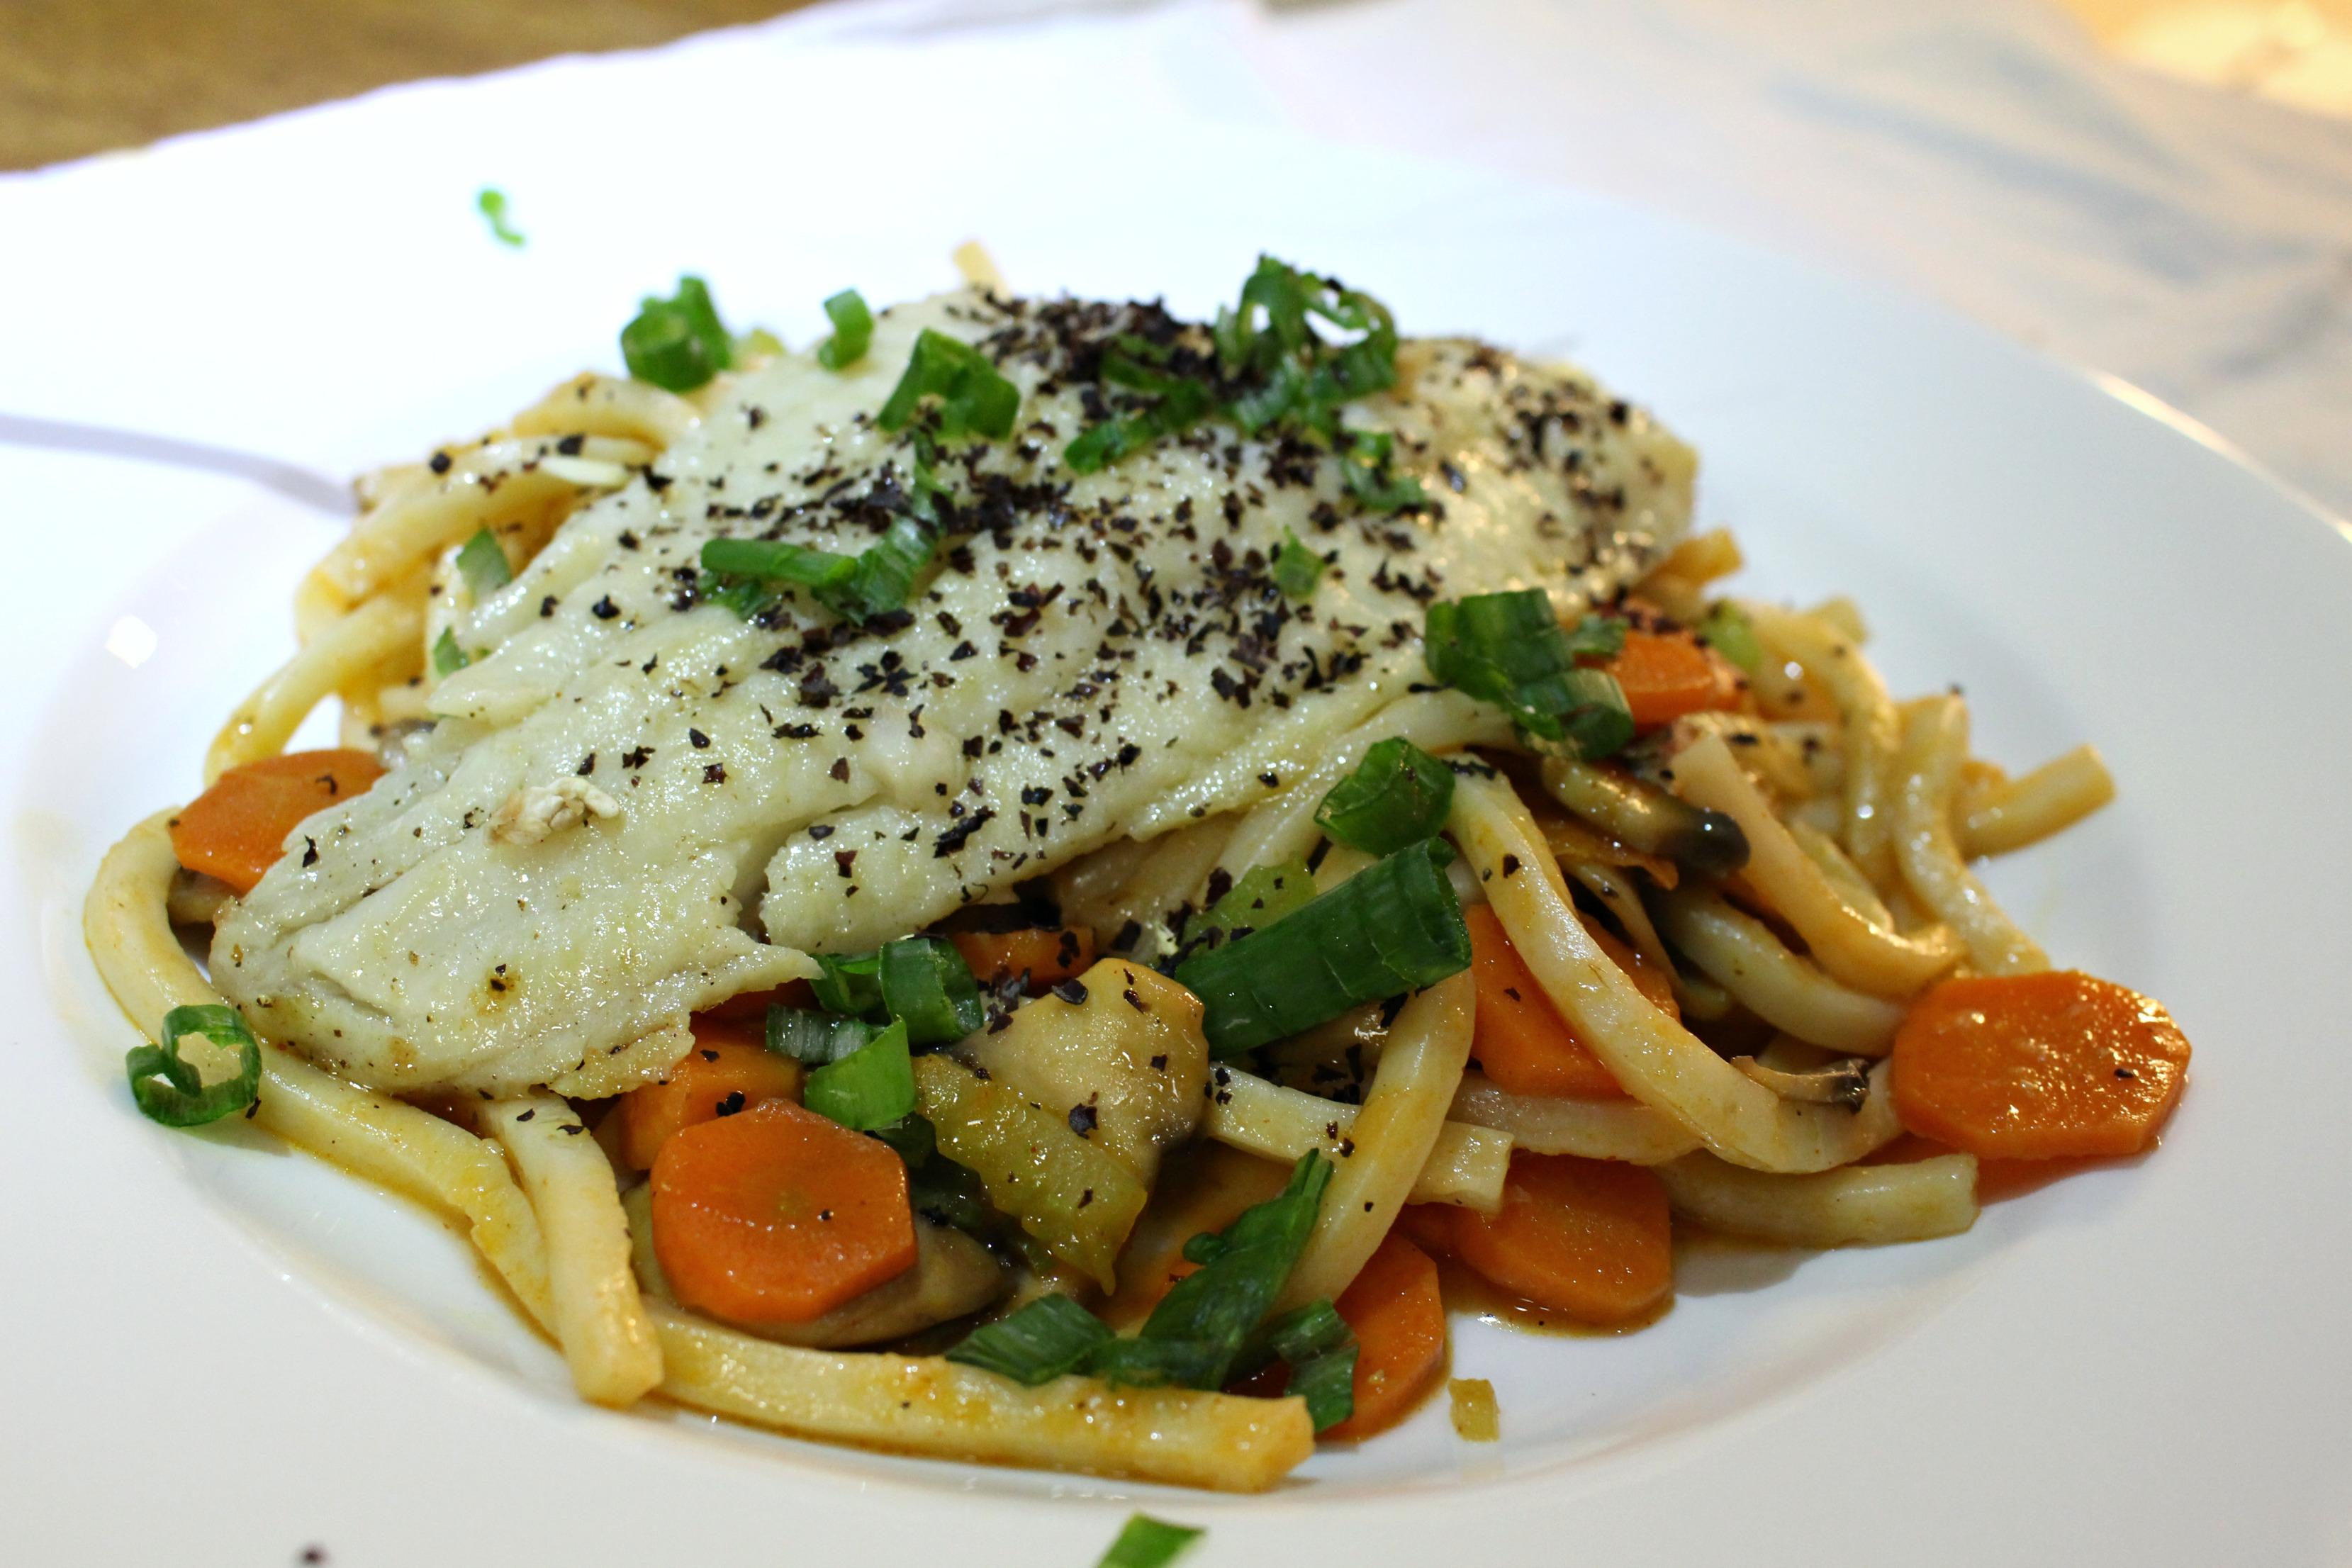 Blue apron udon noodles - Blue Apron Udon Noodles 63